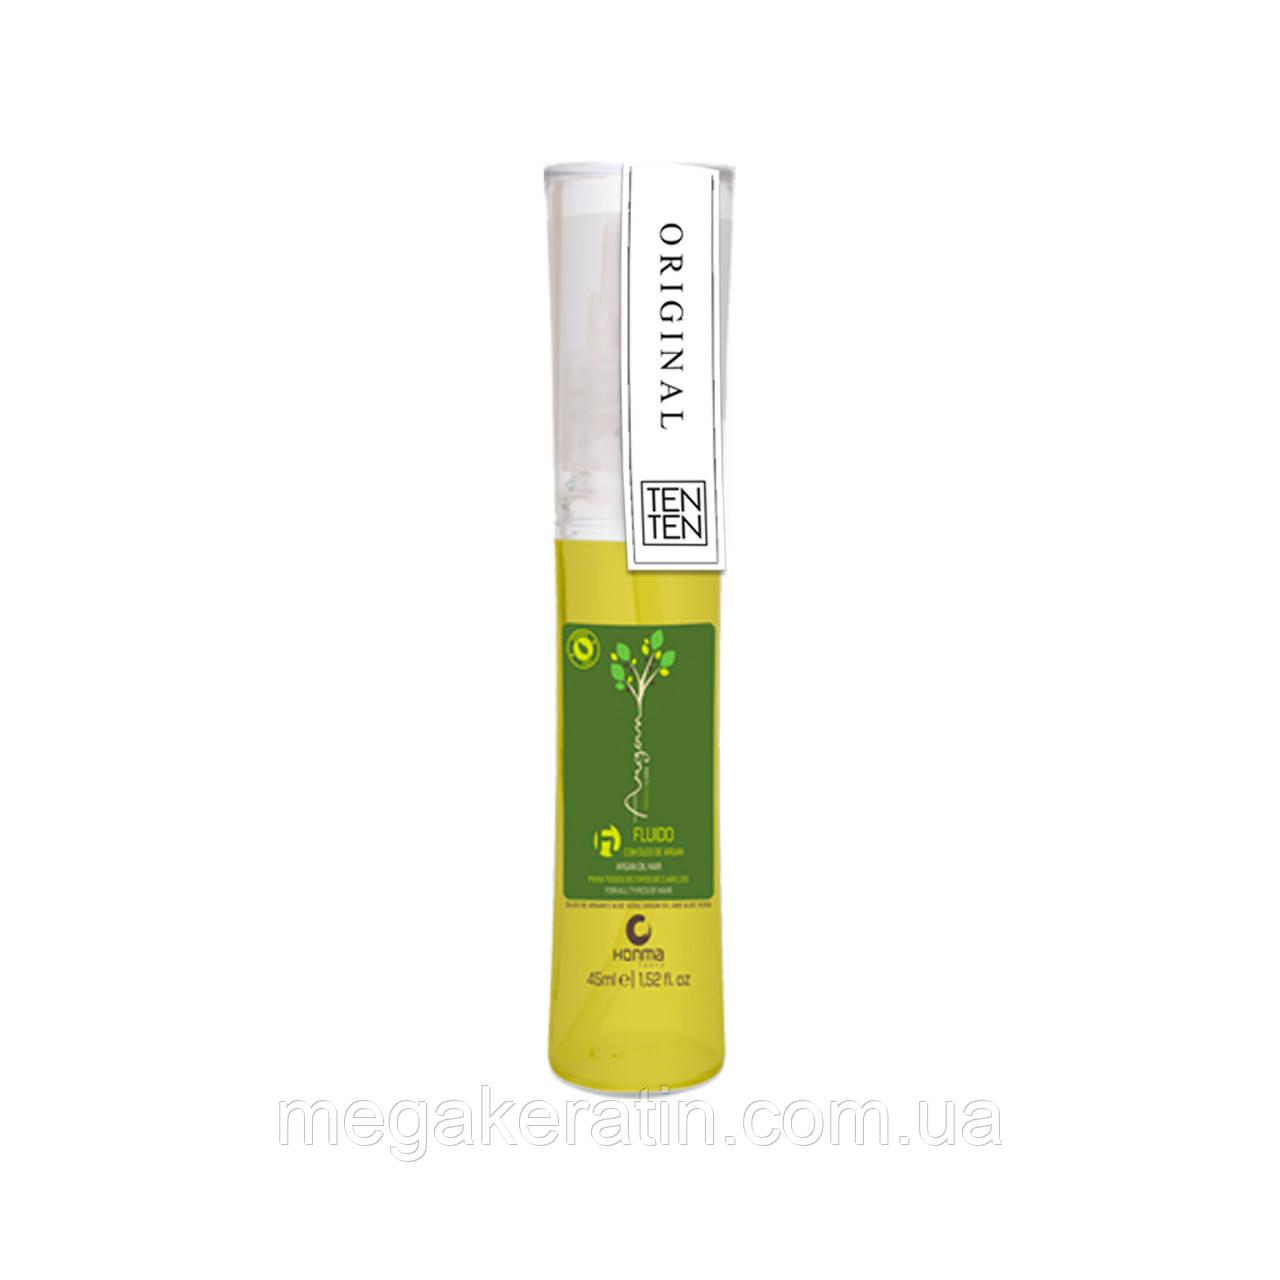 Аргановый флюид ARGAN PERFECT CARE 45 ml